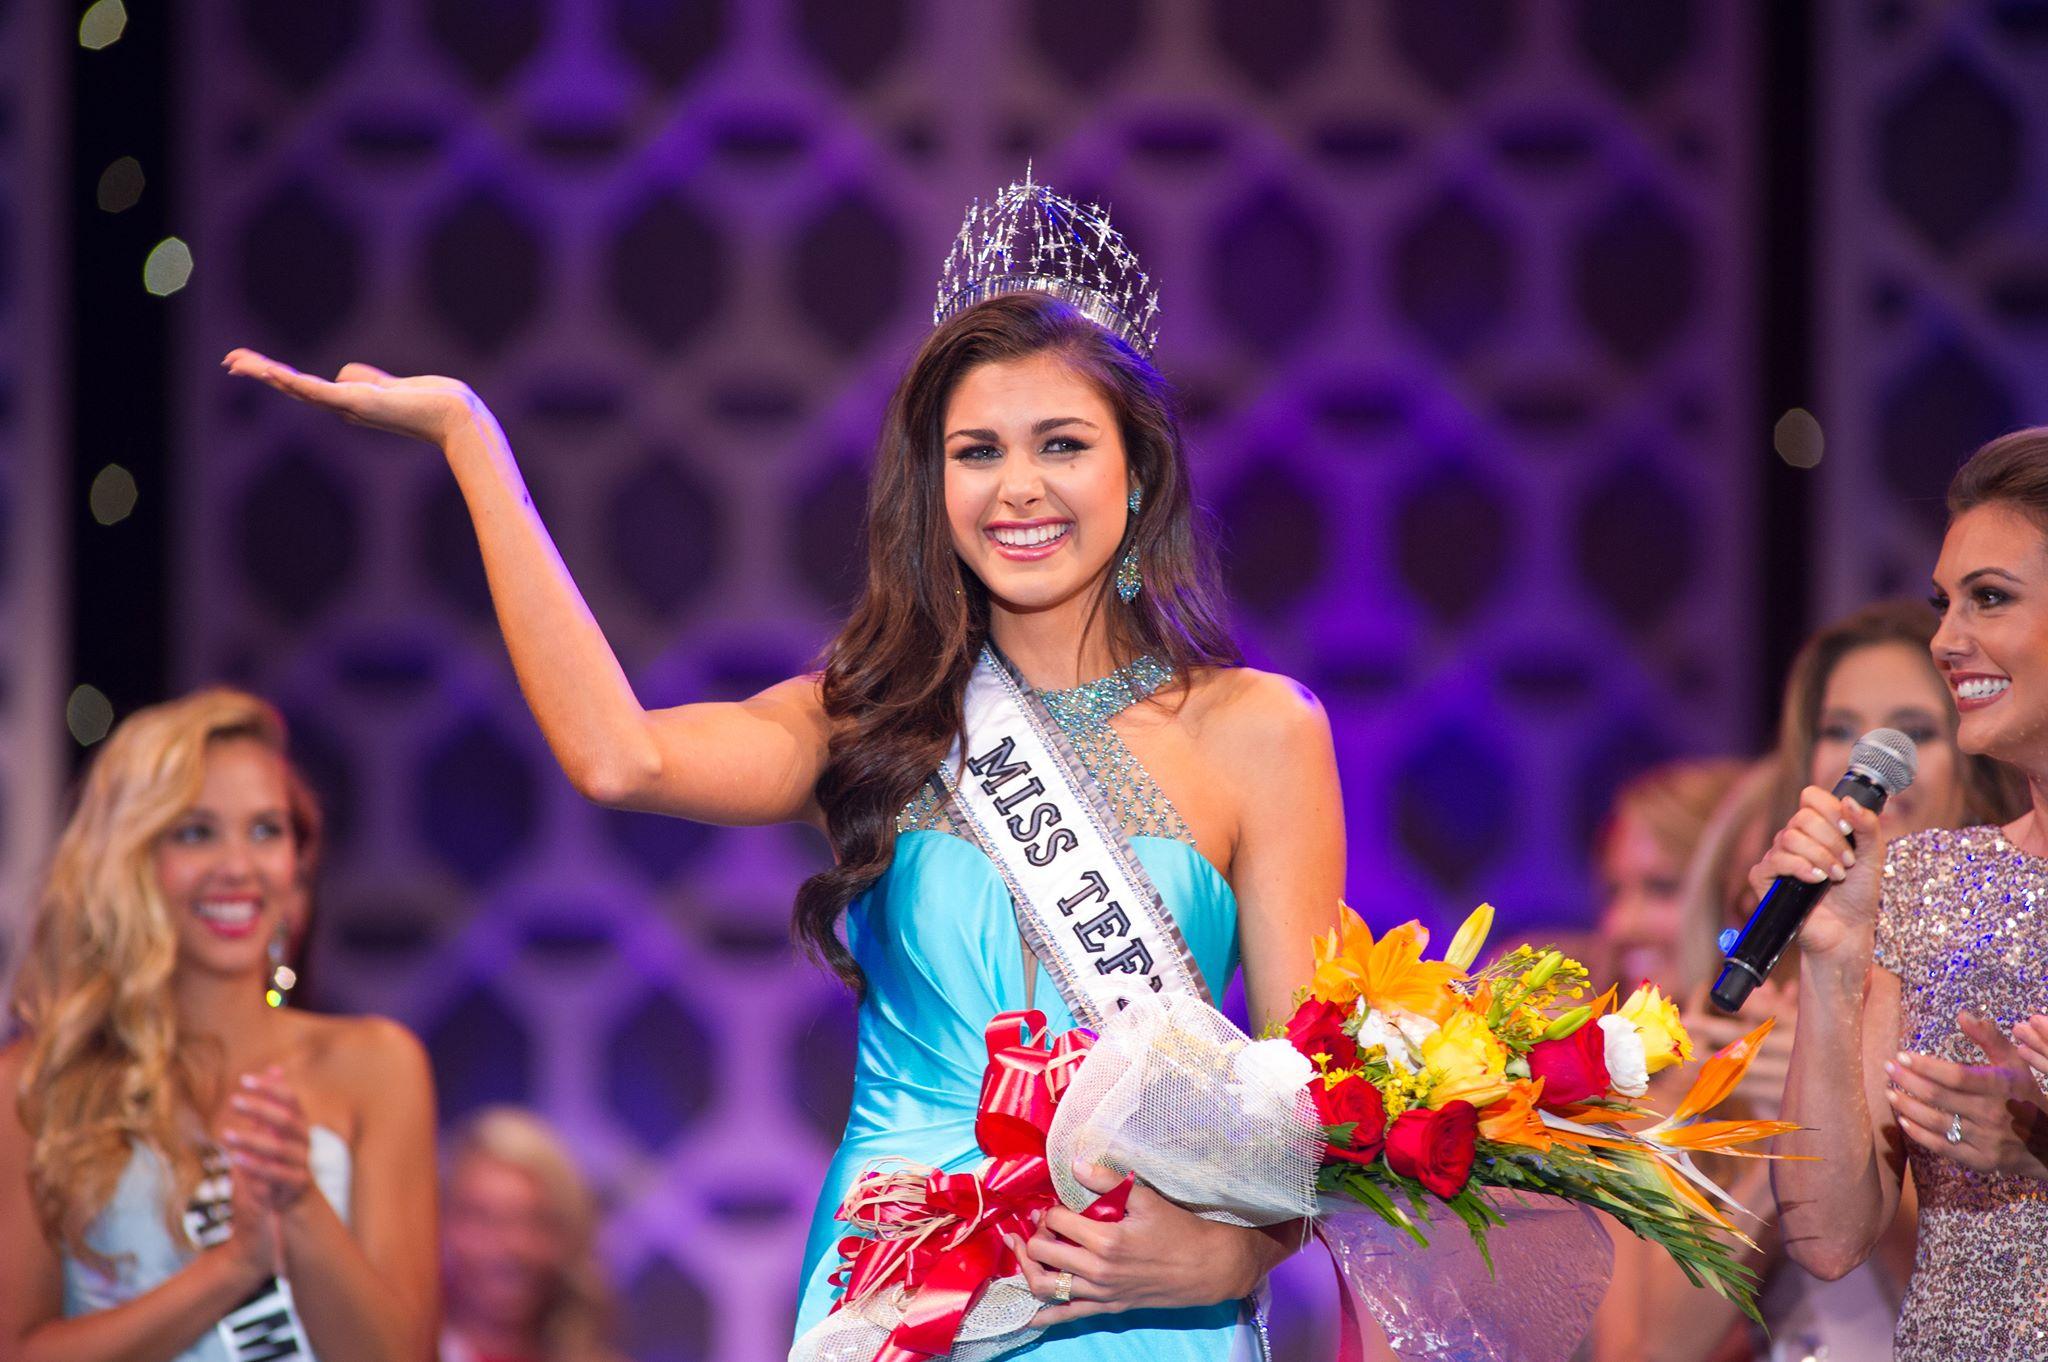 katherine haik, miss teen usa 2015. Katherine-Haik-was-crowned-Miss-Teen-USA-2015_ysy0